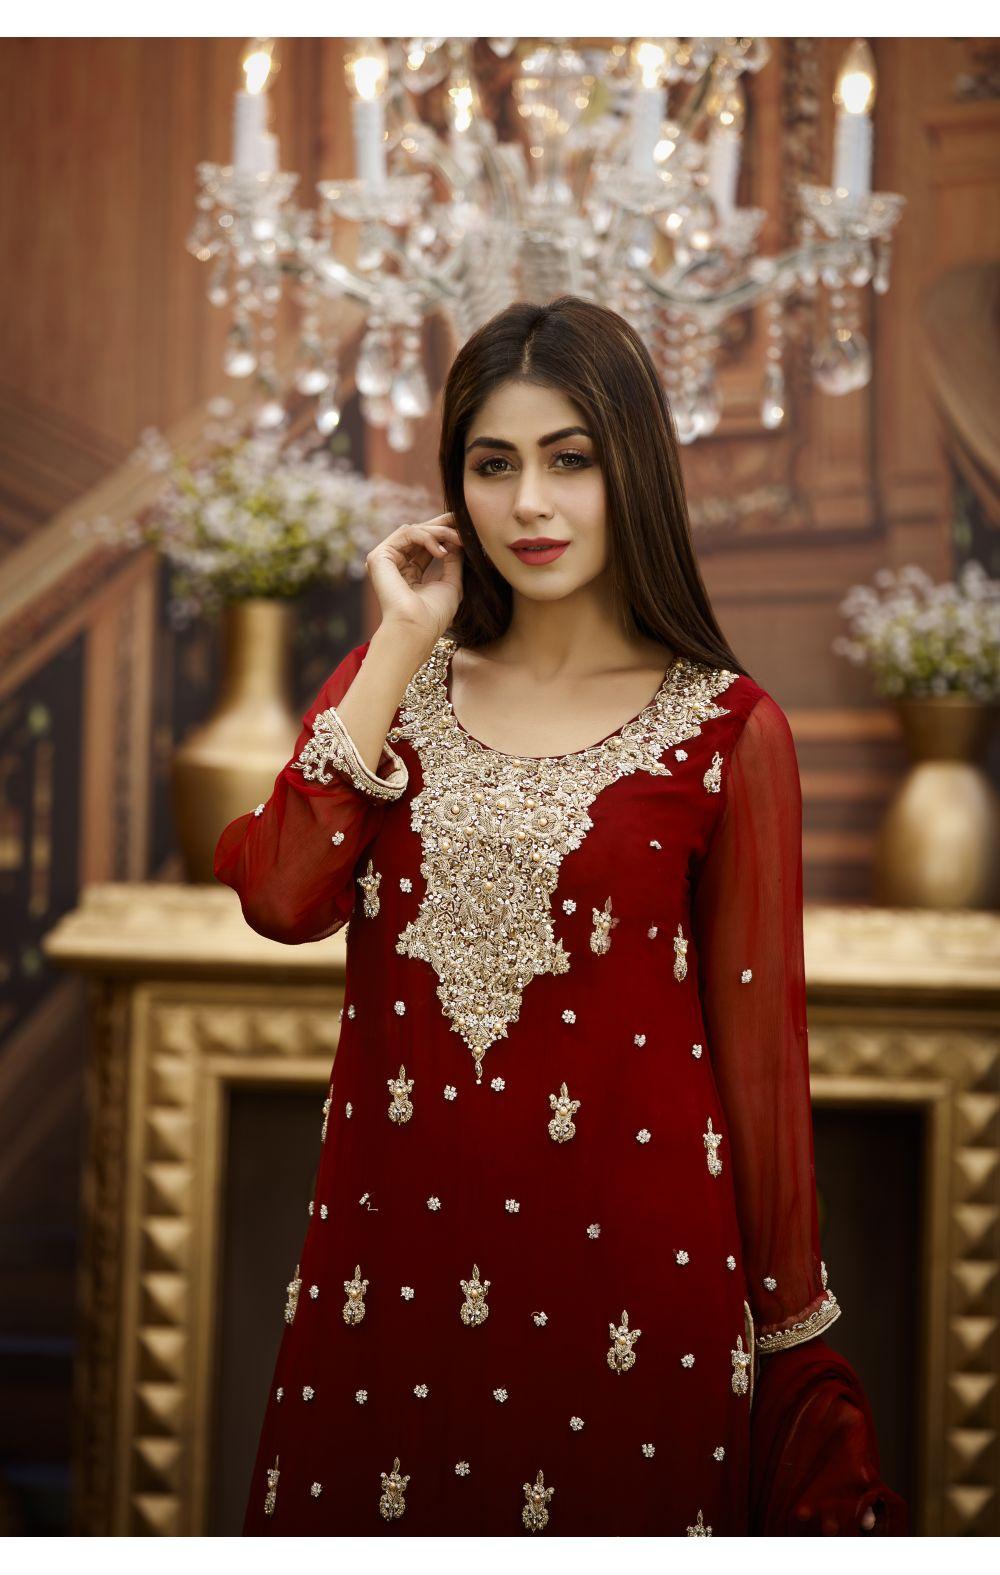 Buy Exclusive Maroon And Golden Bridal Wear – G16464 Online In USA, Uk & Pakistan - 02